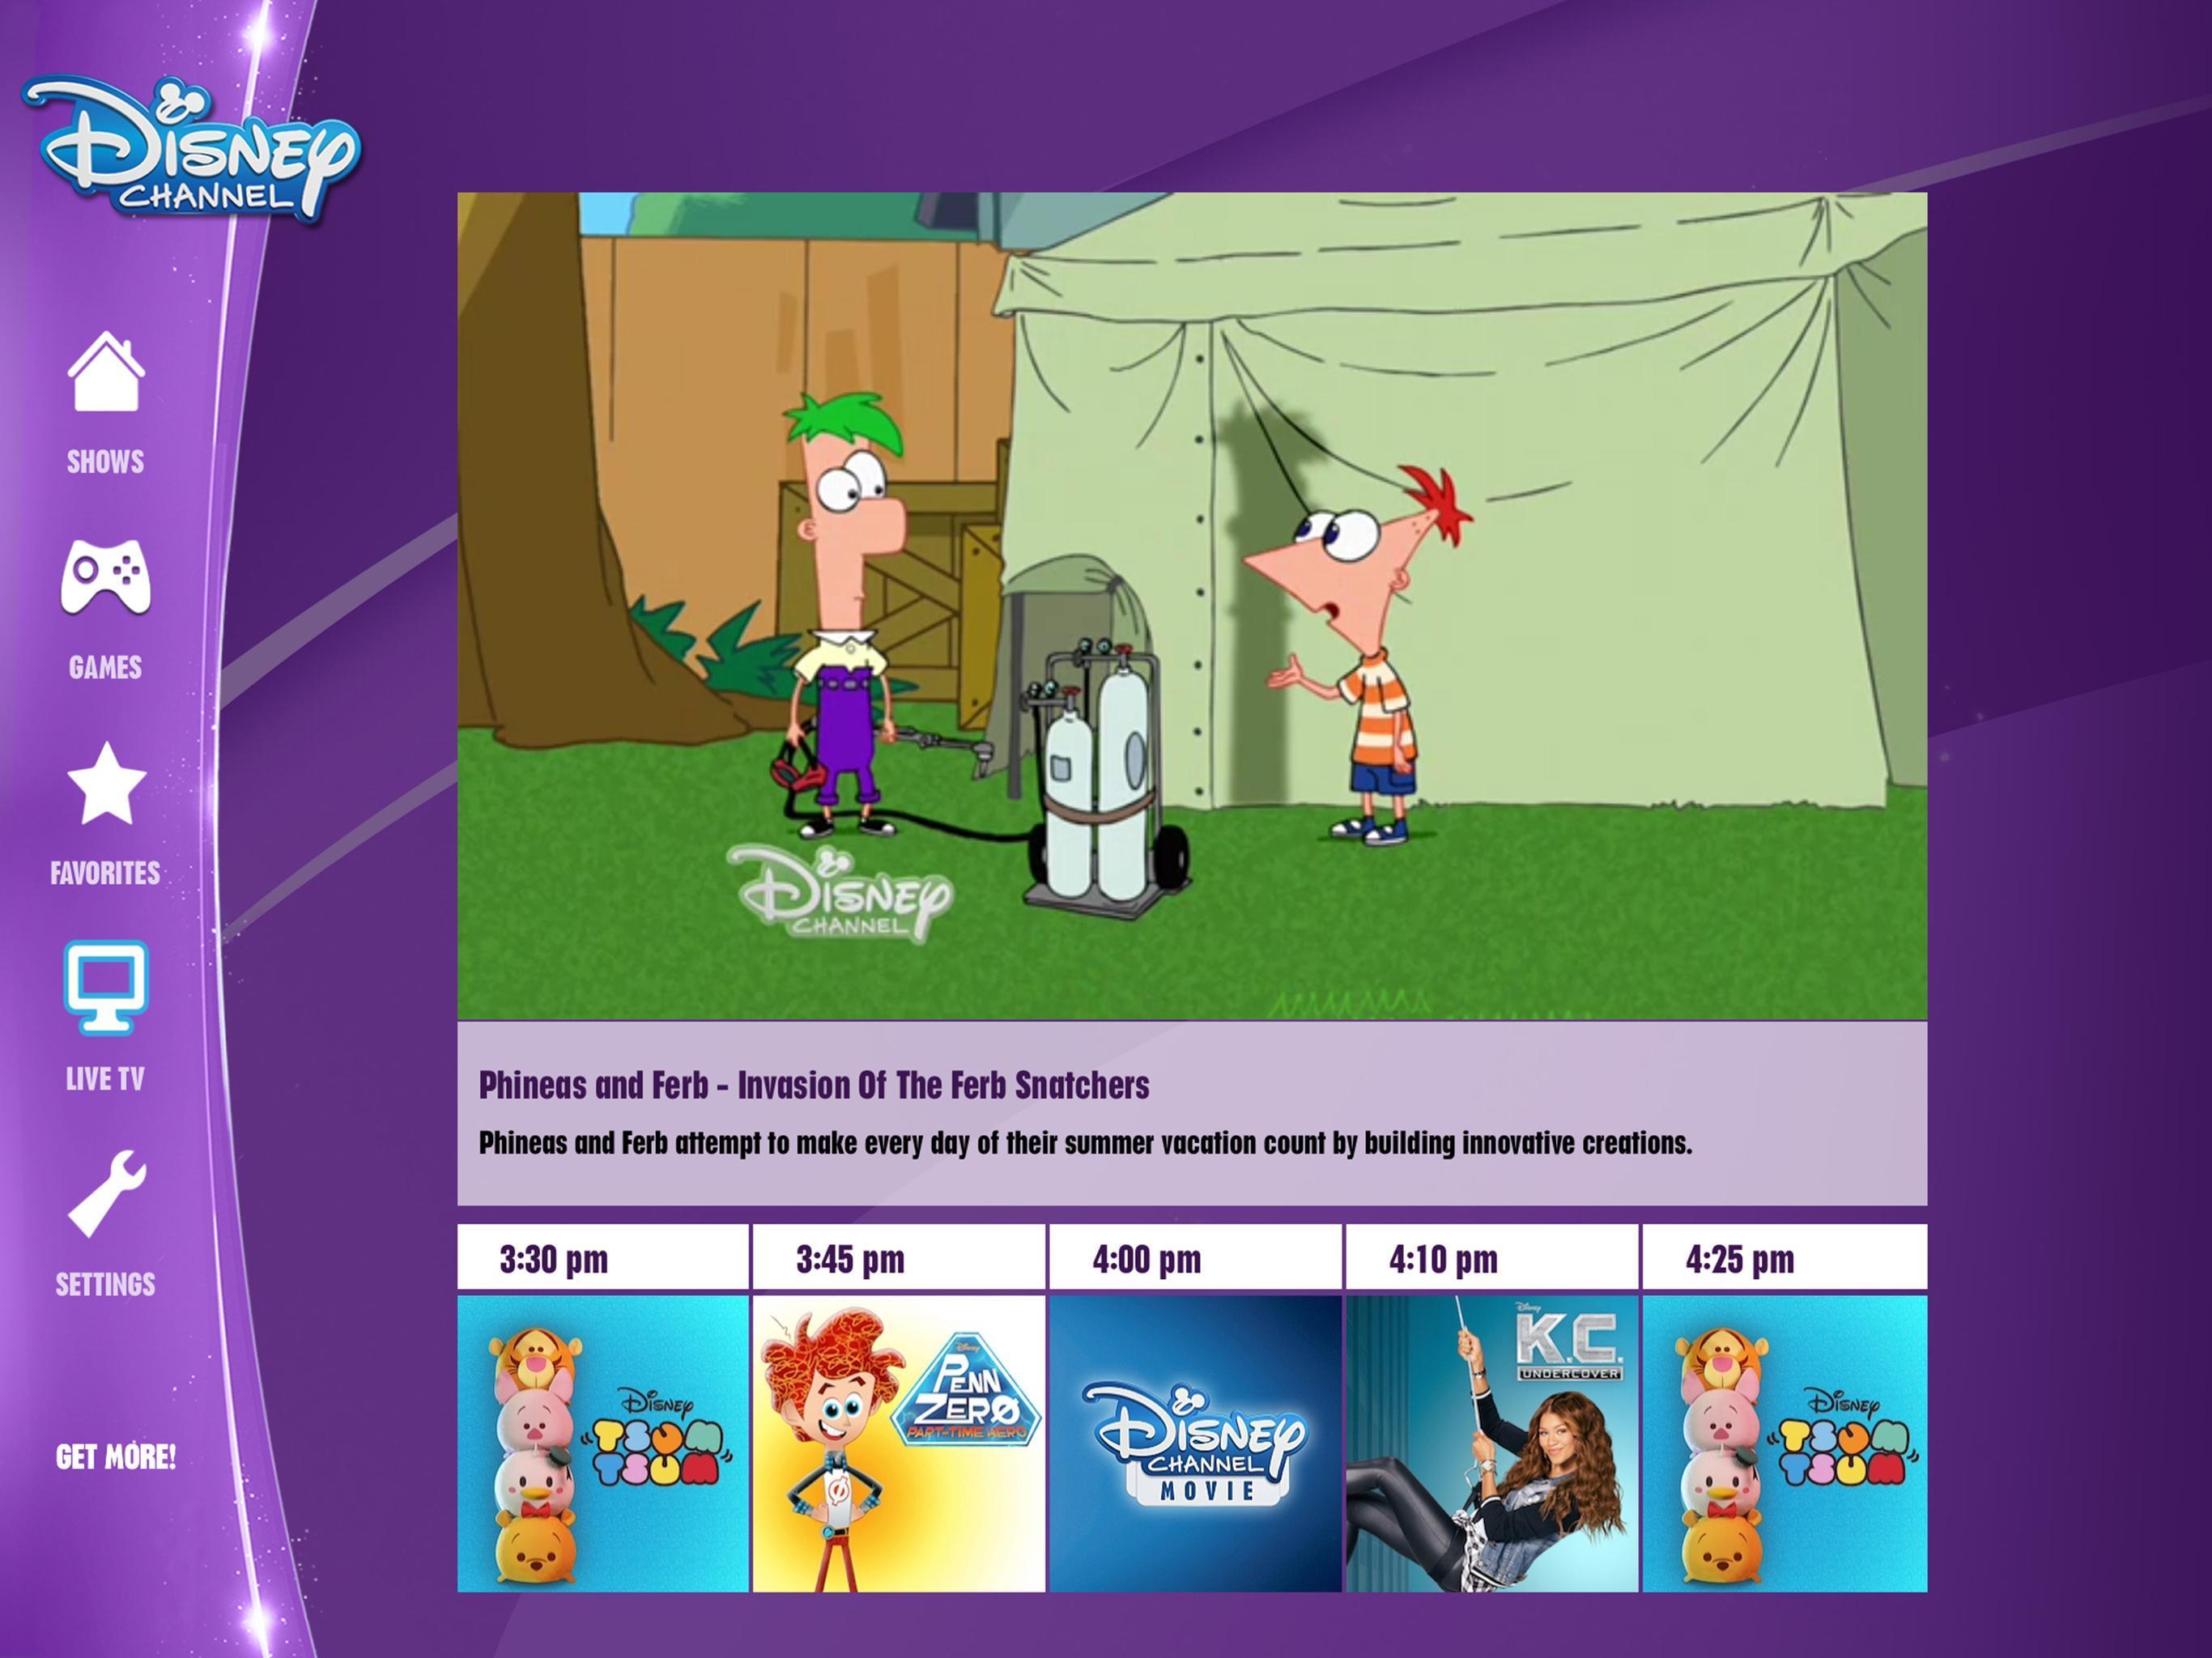 Disney channel apk download